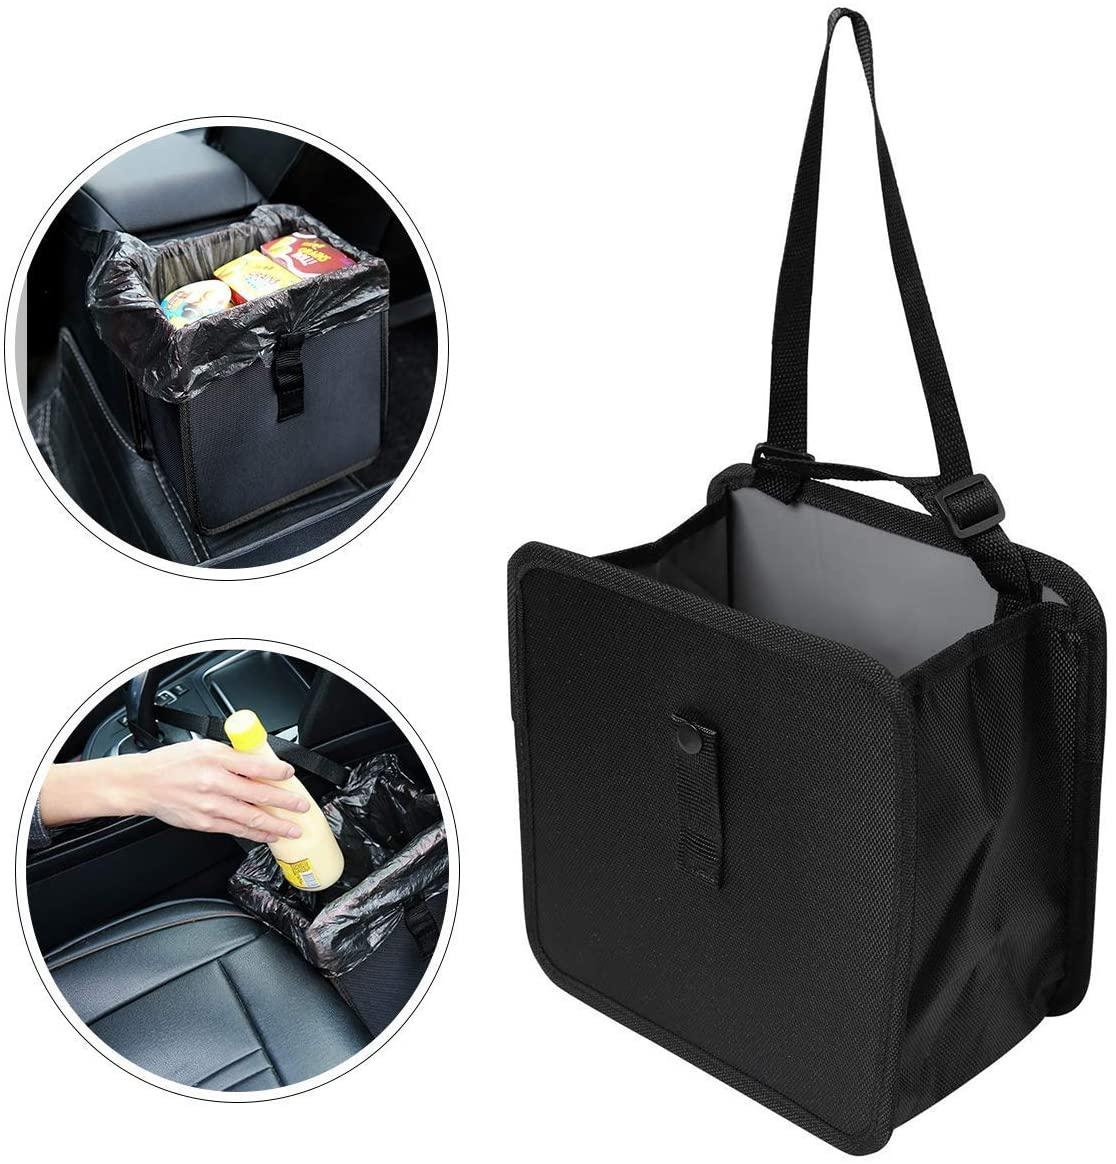 WildAuto Hanging Car Trash Can Leak Proof Car Trash Bag Collapsible Car Garbage Can 6.5Ltr Capacity (Black)